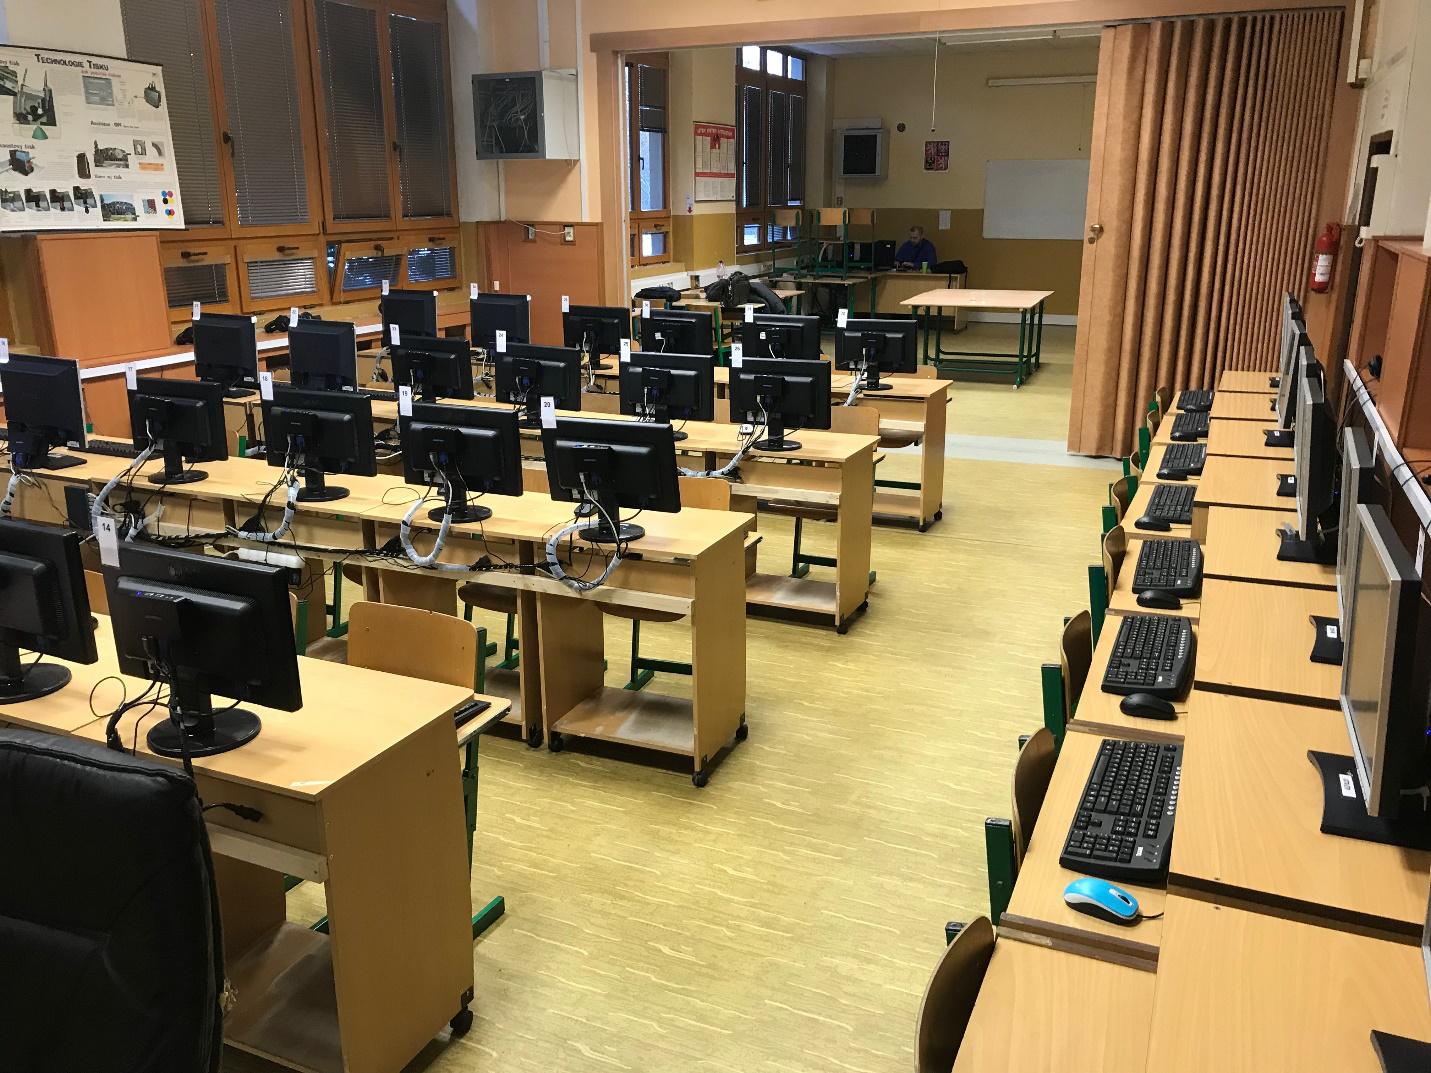 Brigadniku-Praha-Primary-school-in-Slovakia2